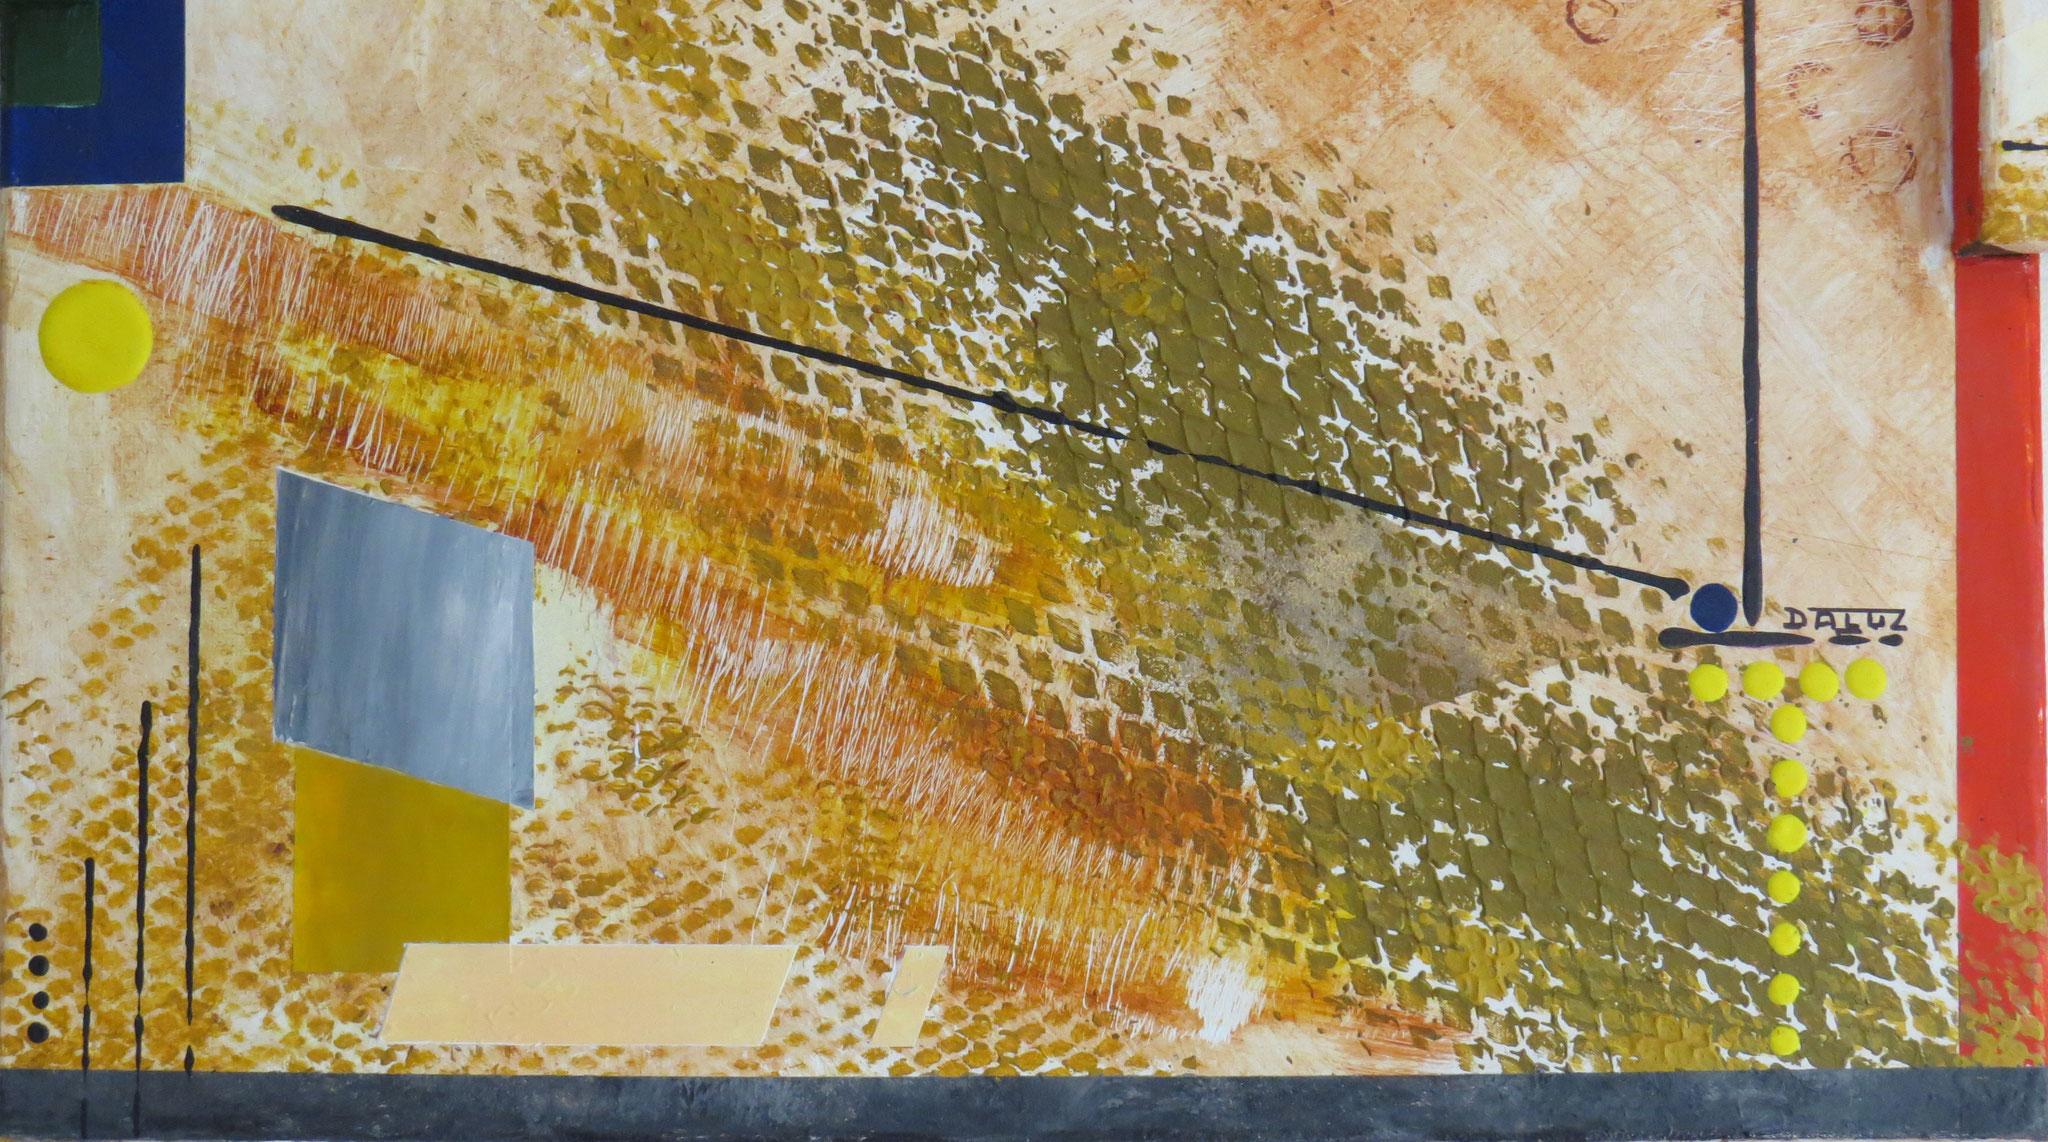 syncrétisme. vue de zoom1 - daluz galego tableau abstrait abstraction